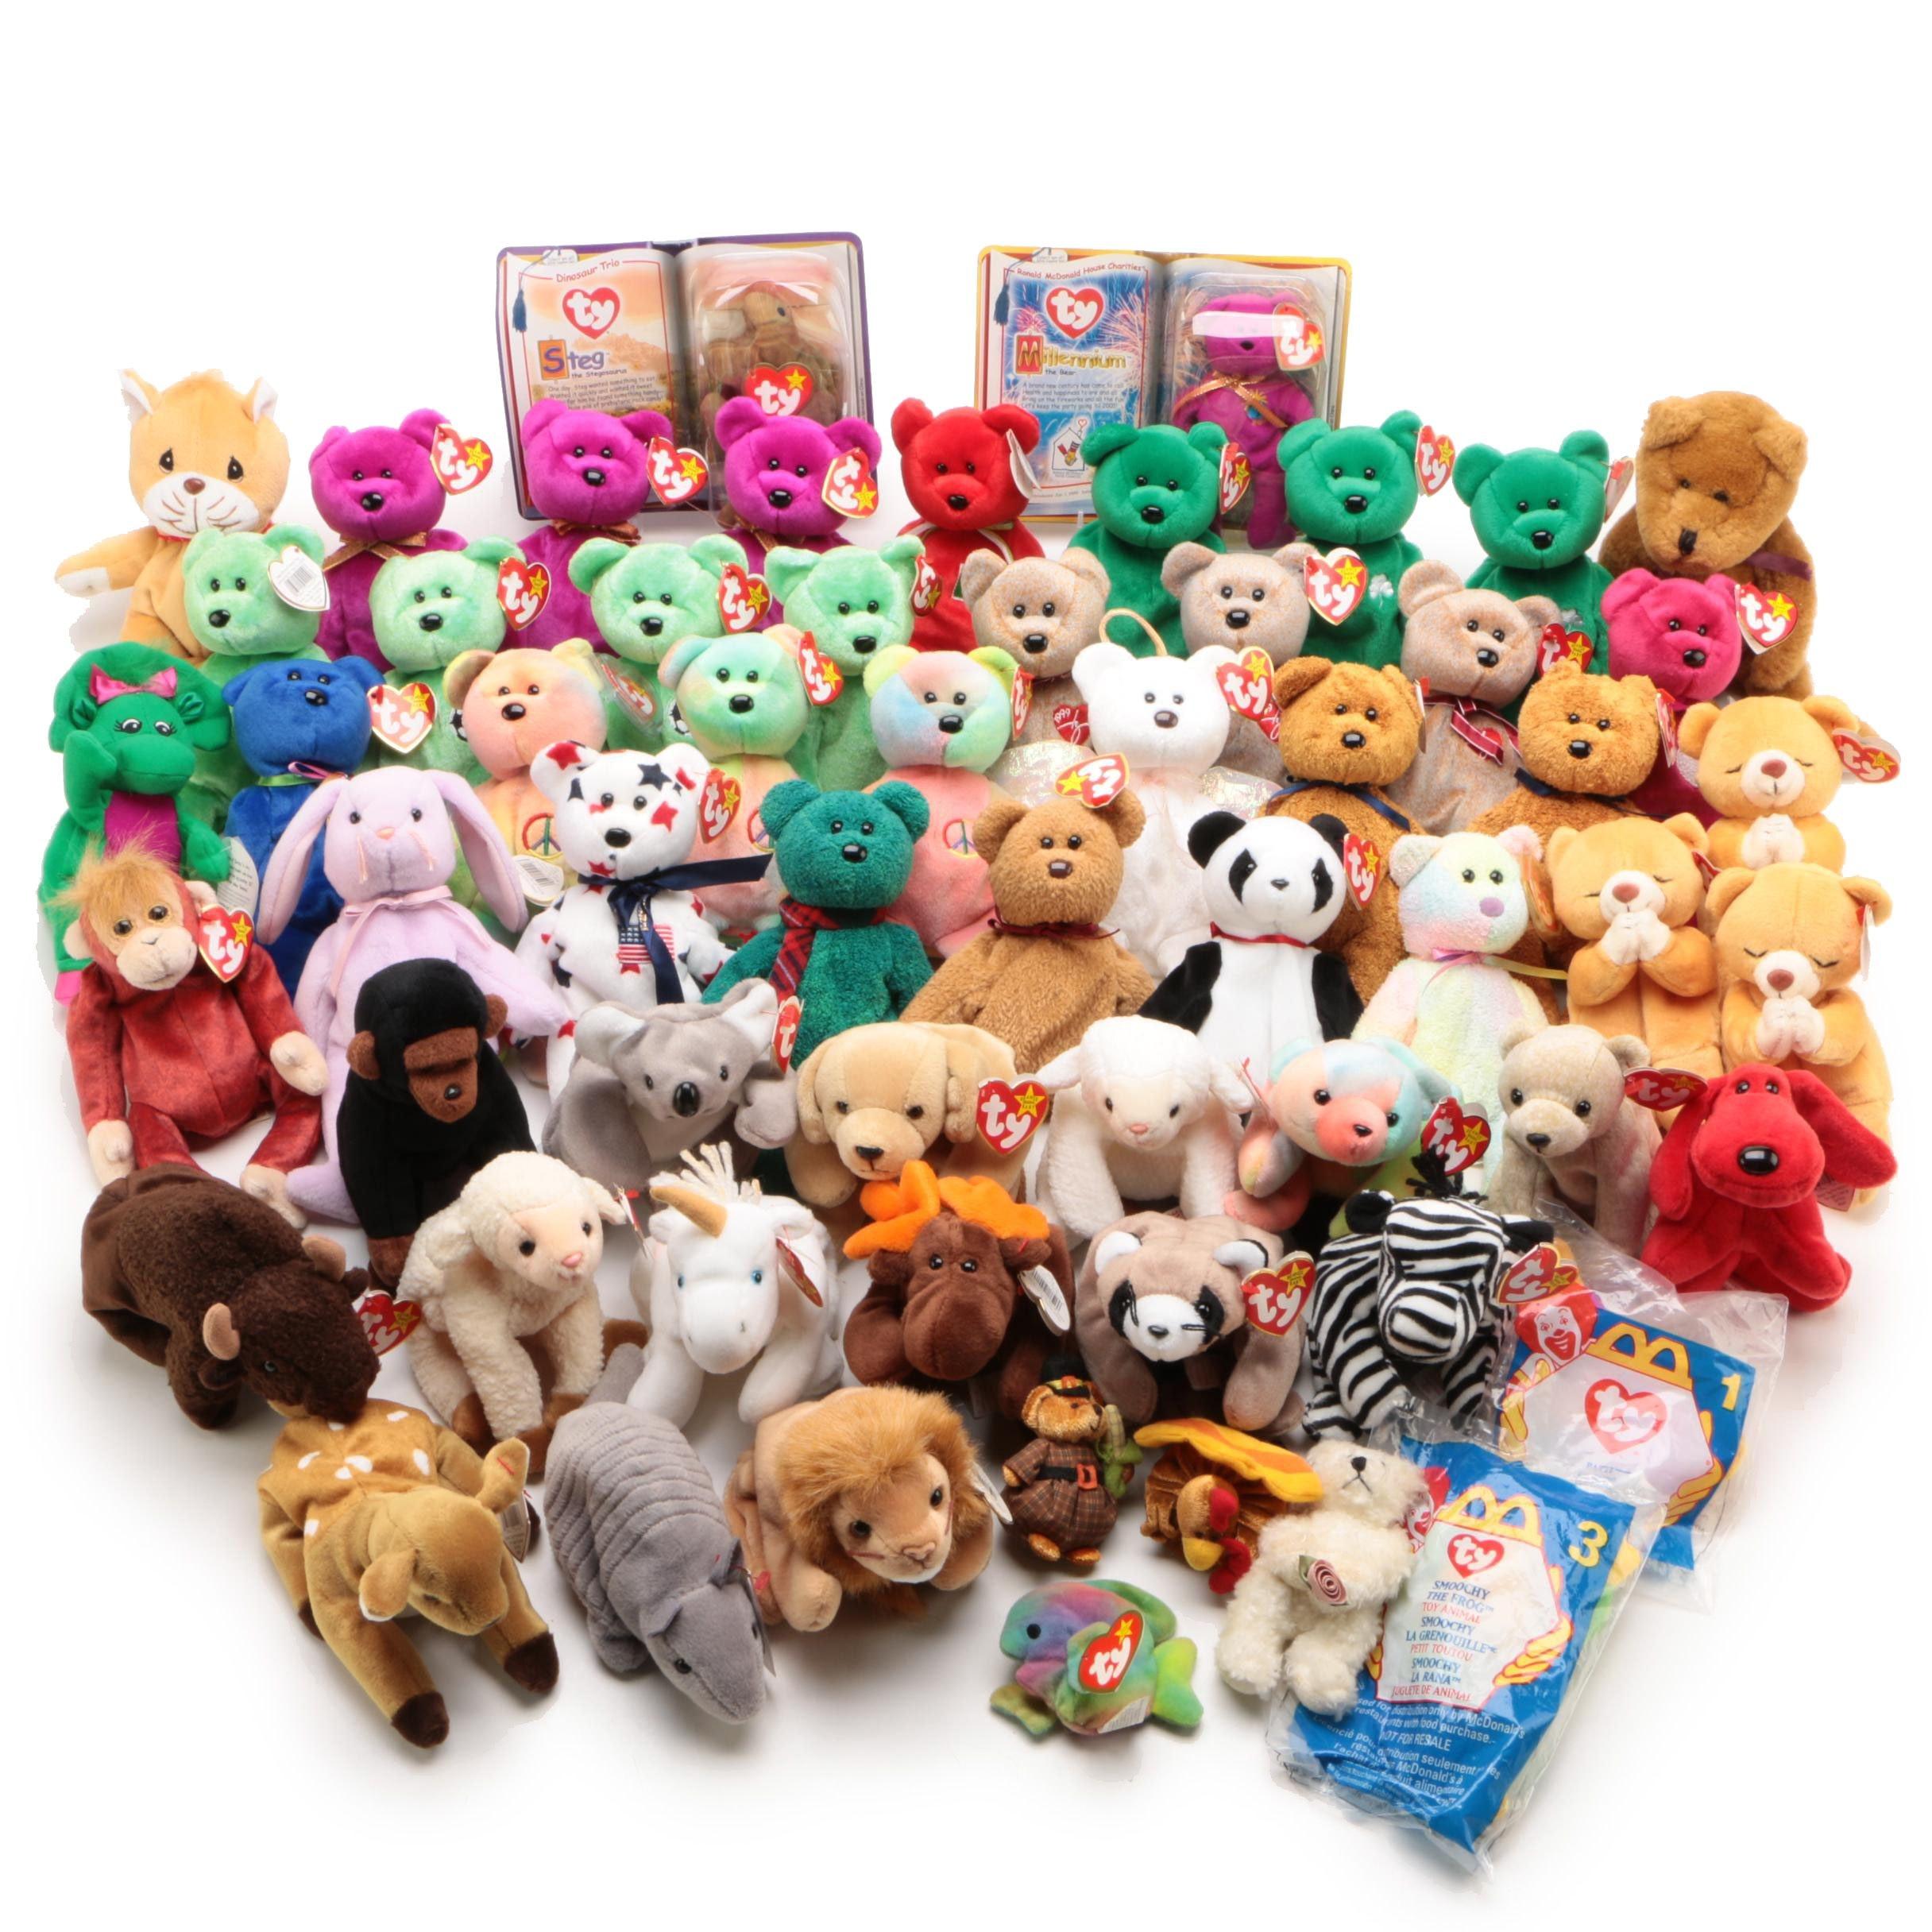 Ty Beanie Babies Stuffed Toys